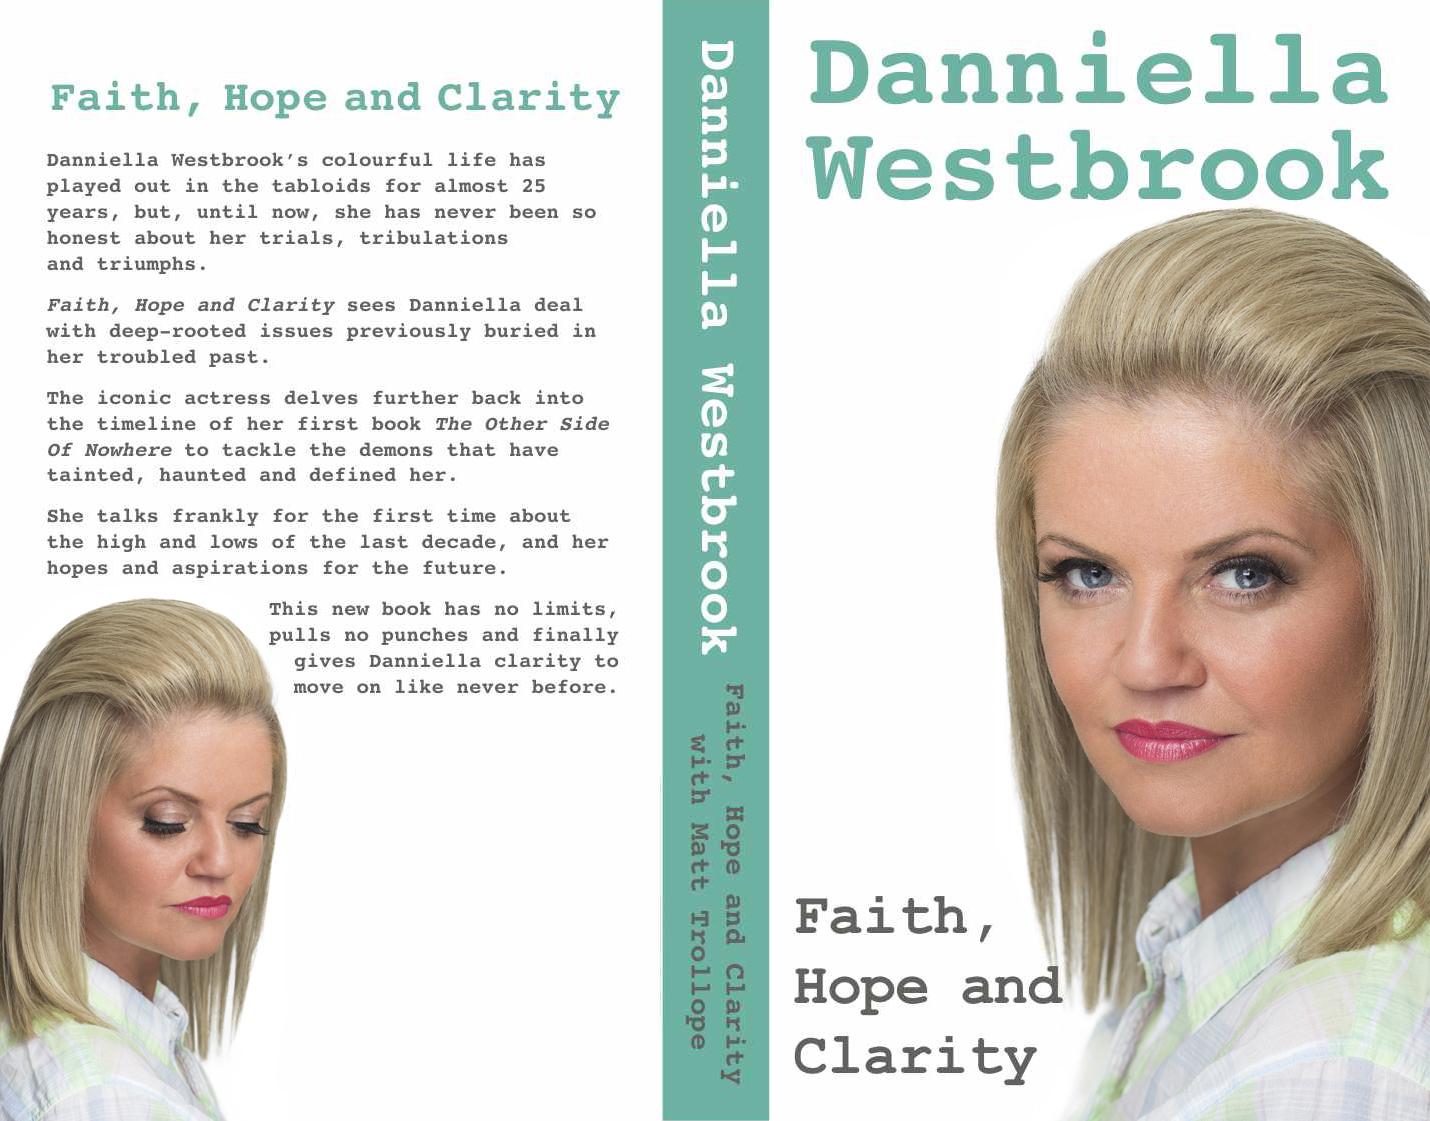 Danniella Westbrook's Book Cover